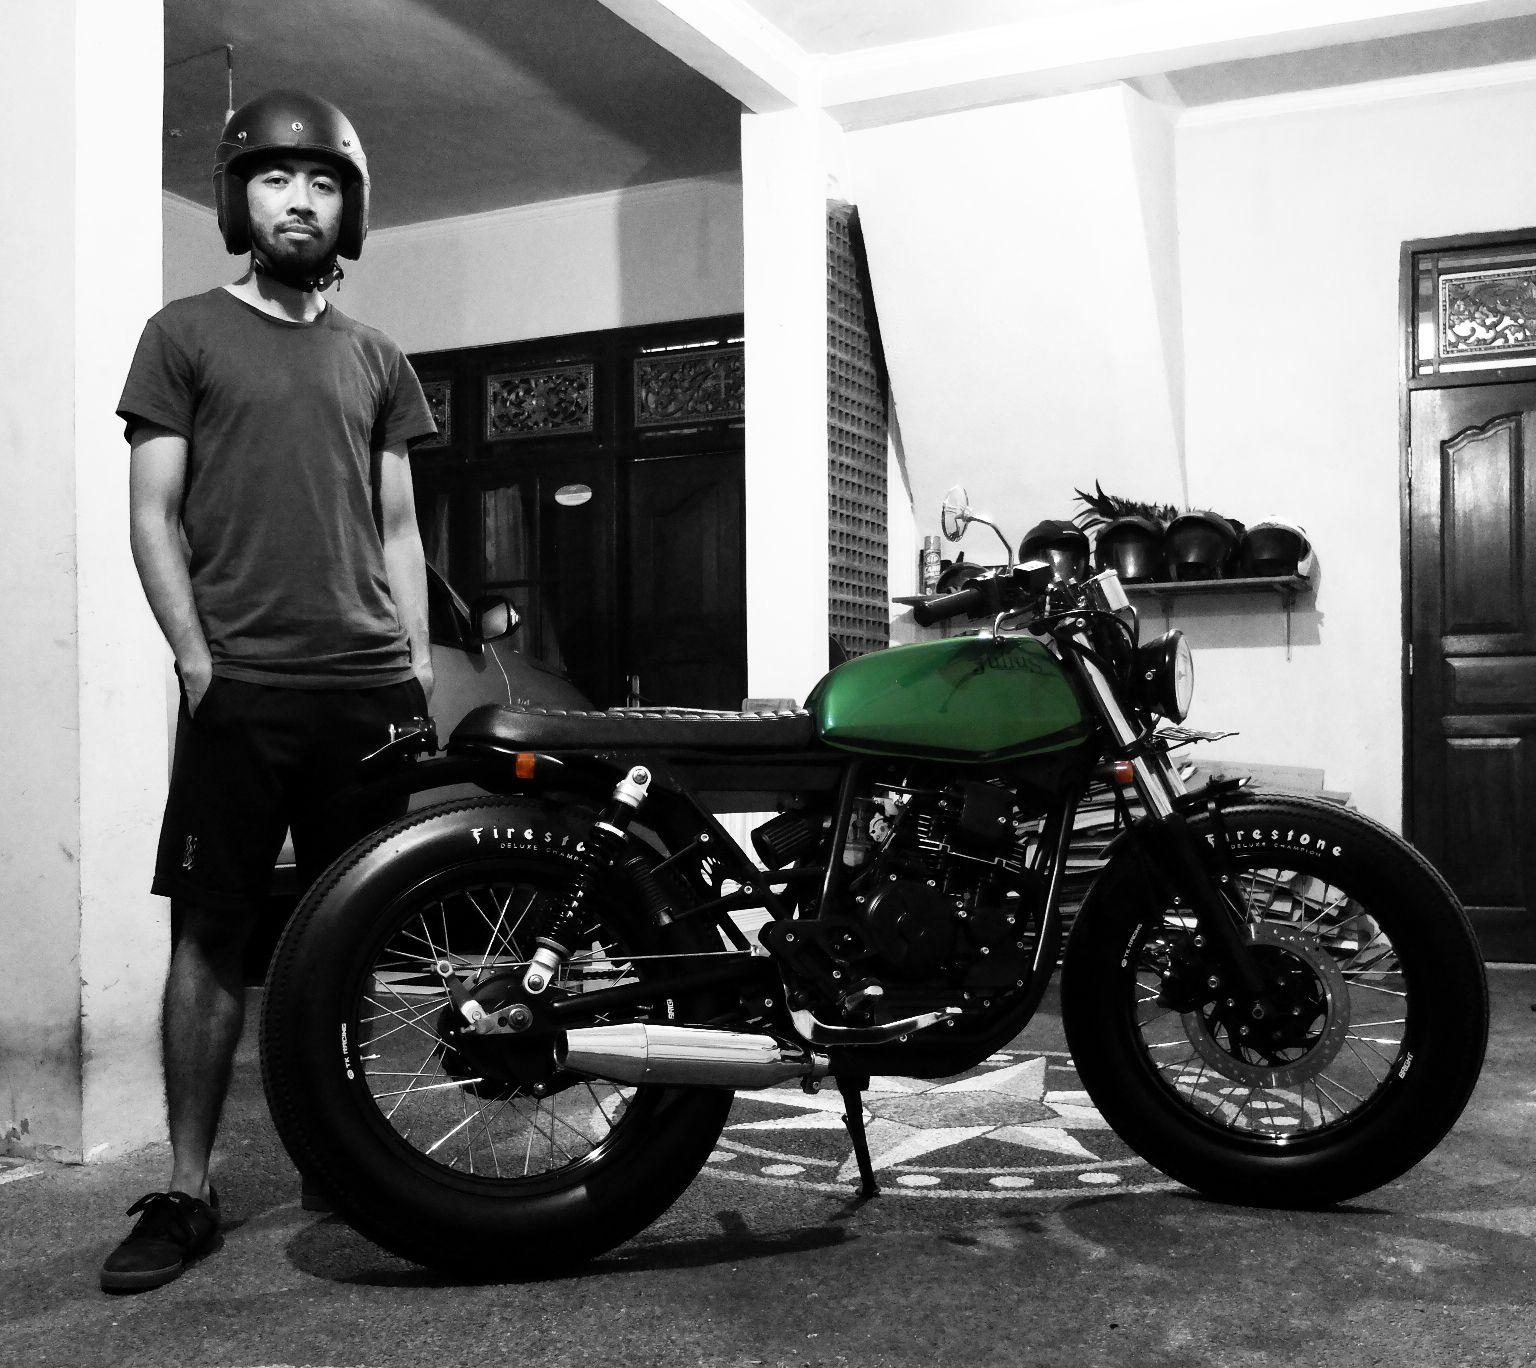 Green Tank Julius Bratstyle Bali Yamaha Scorpio 2013